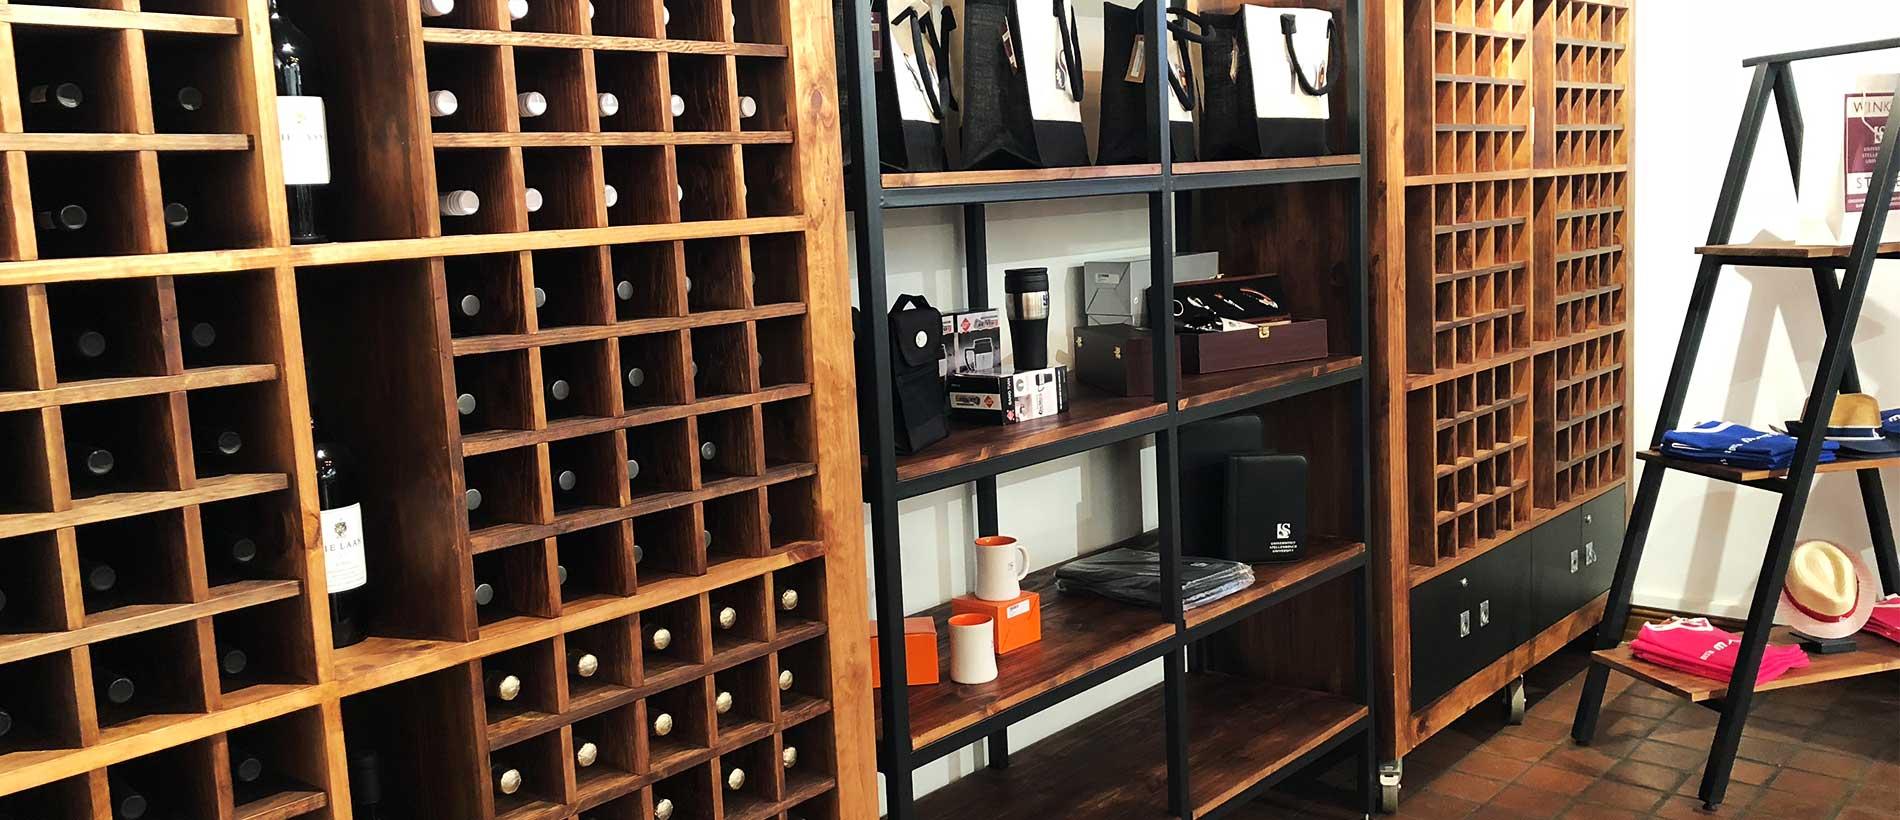 4id Retail Interior Design Shop Fitting